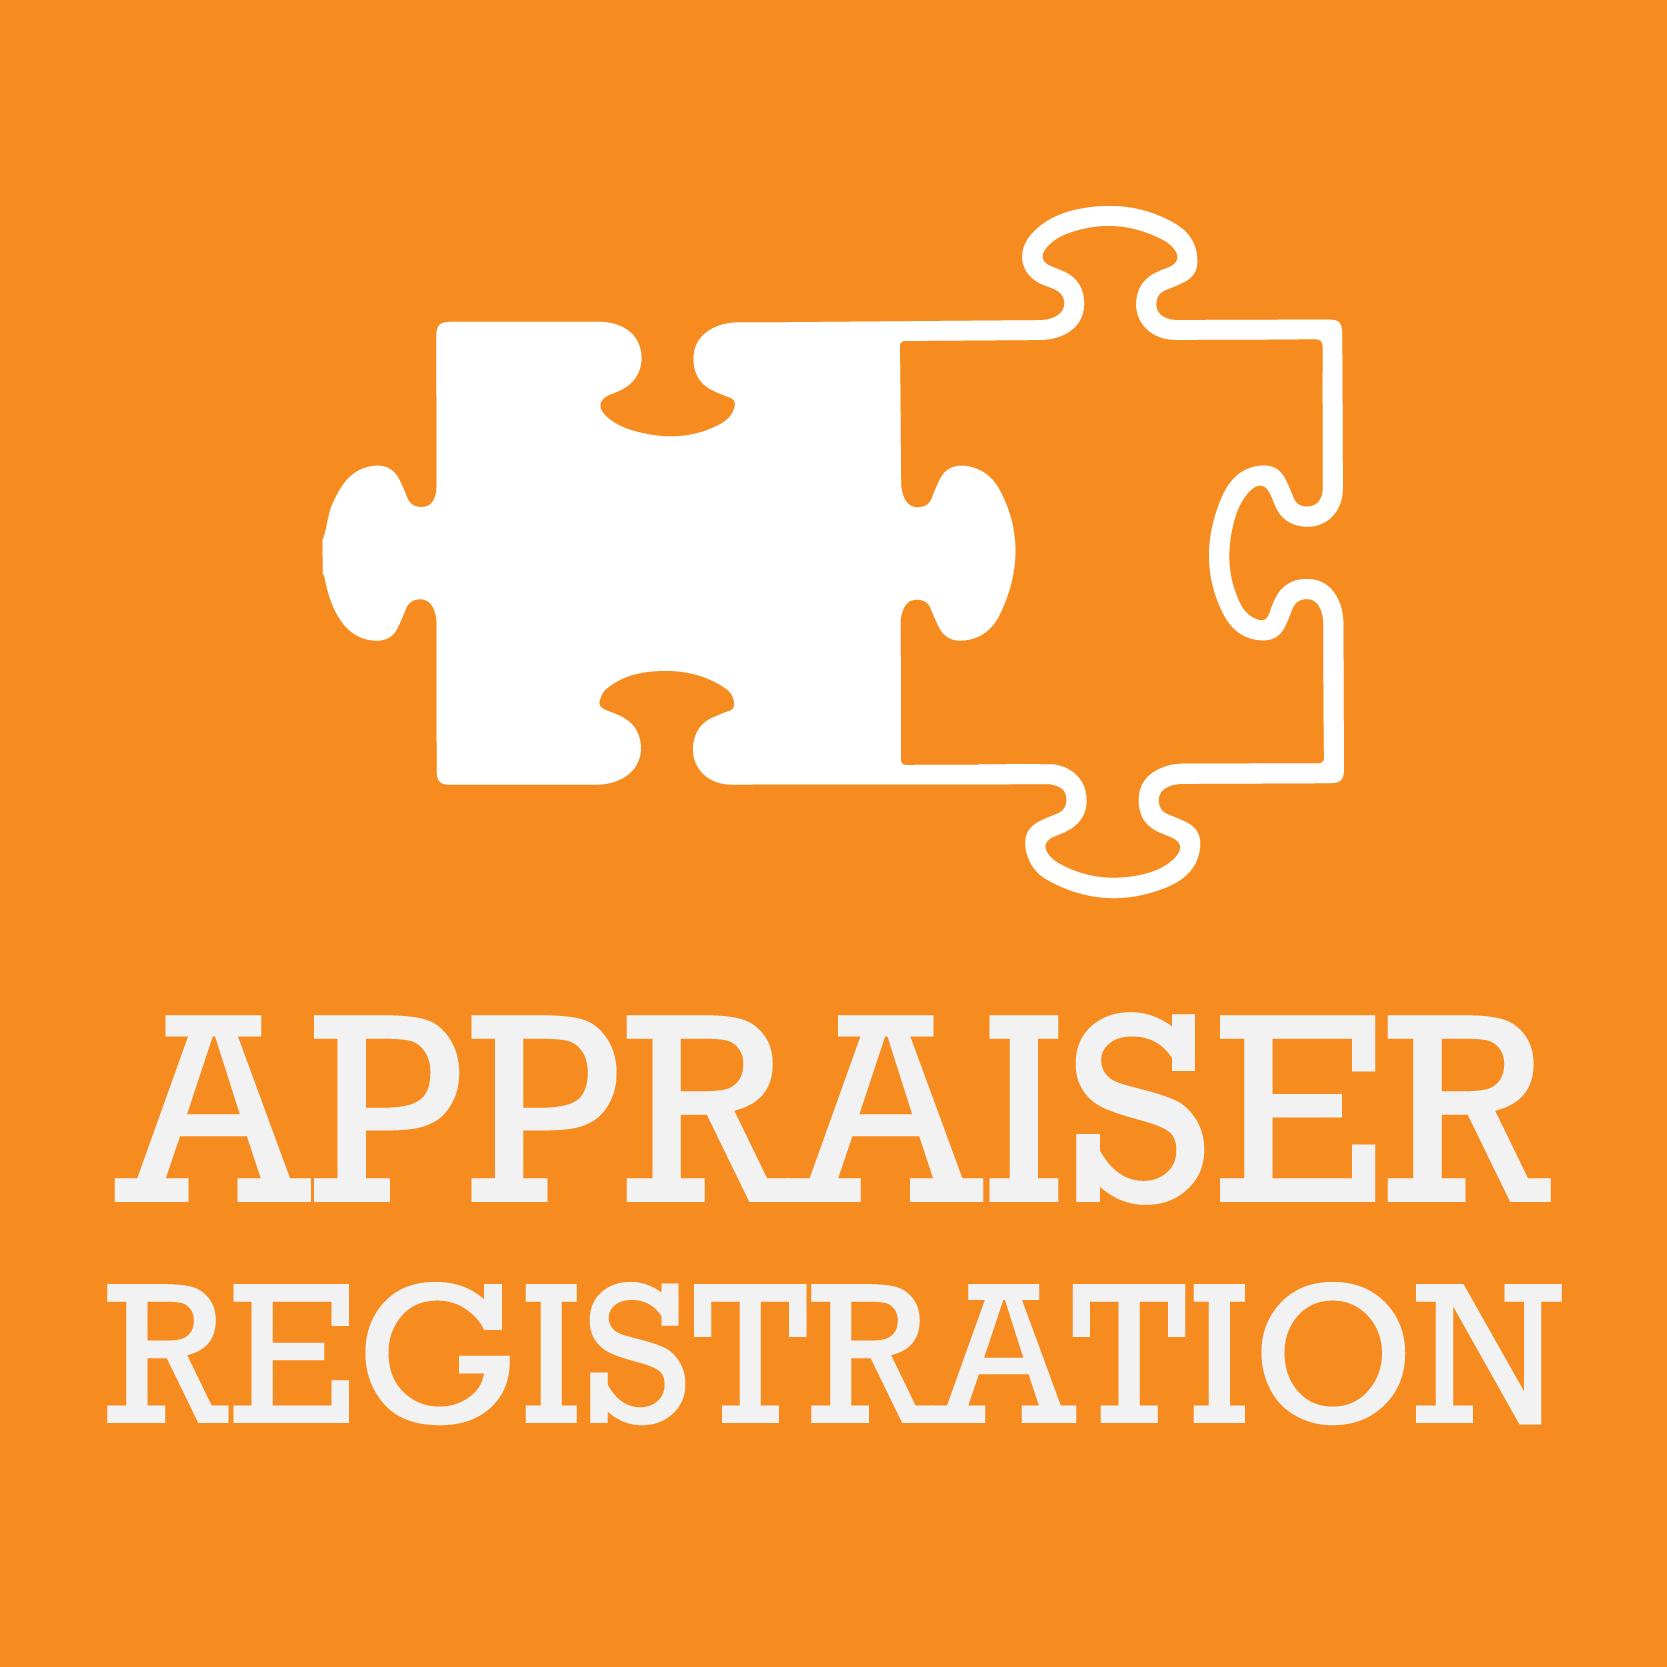 Appraiser Registration